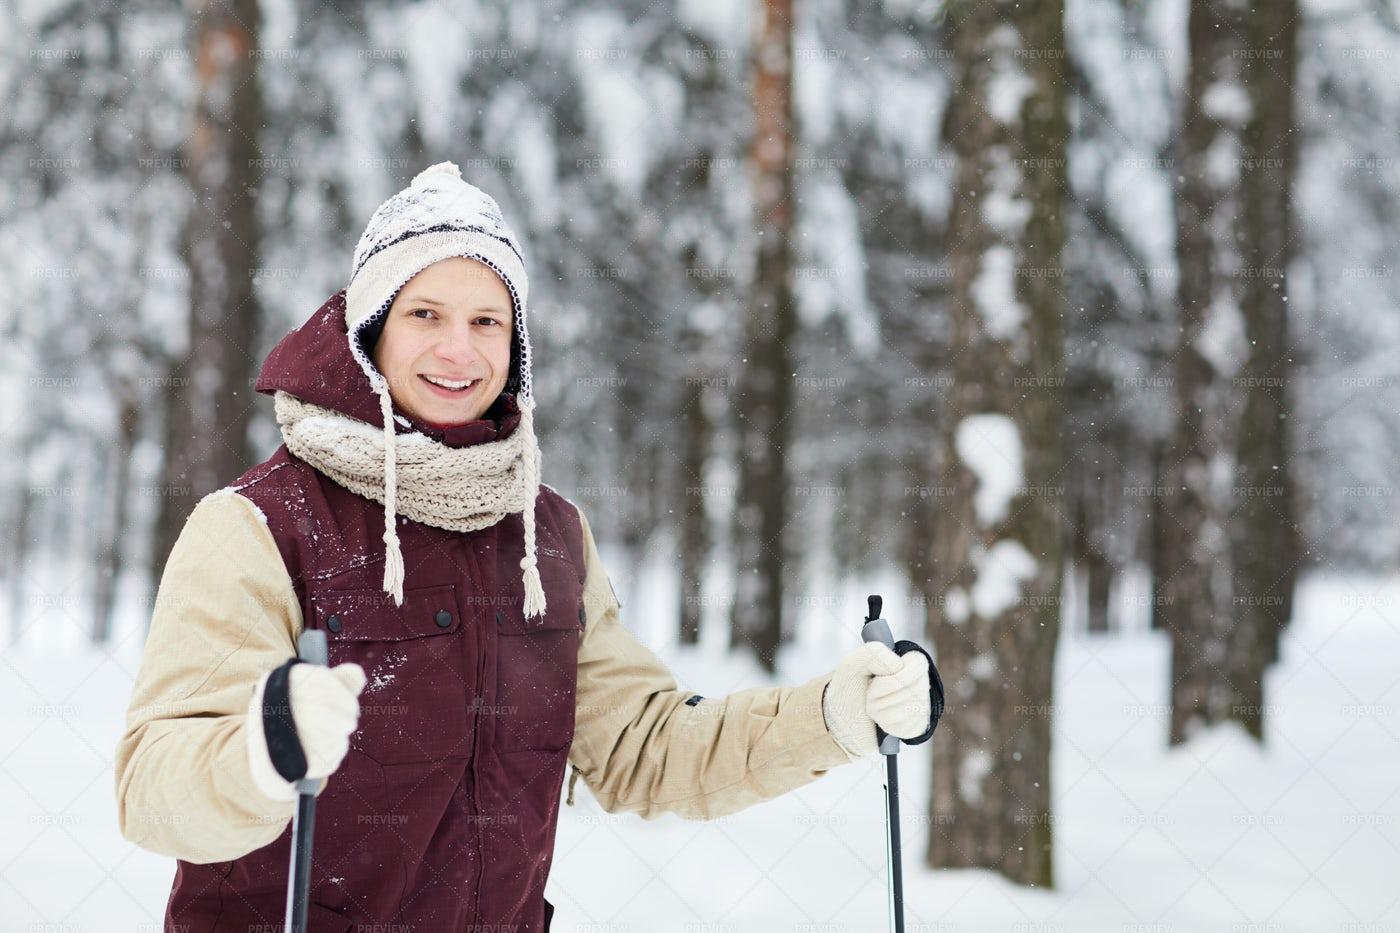 Active Young Man Skiing In Snow: Stock Photos